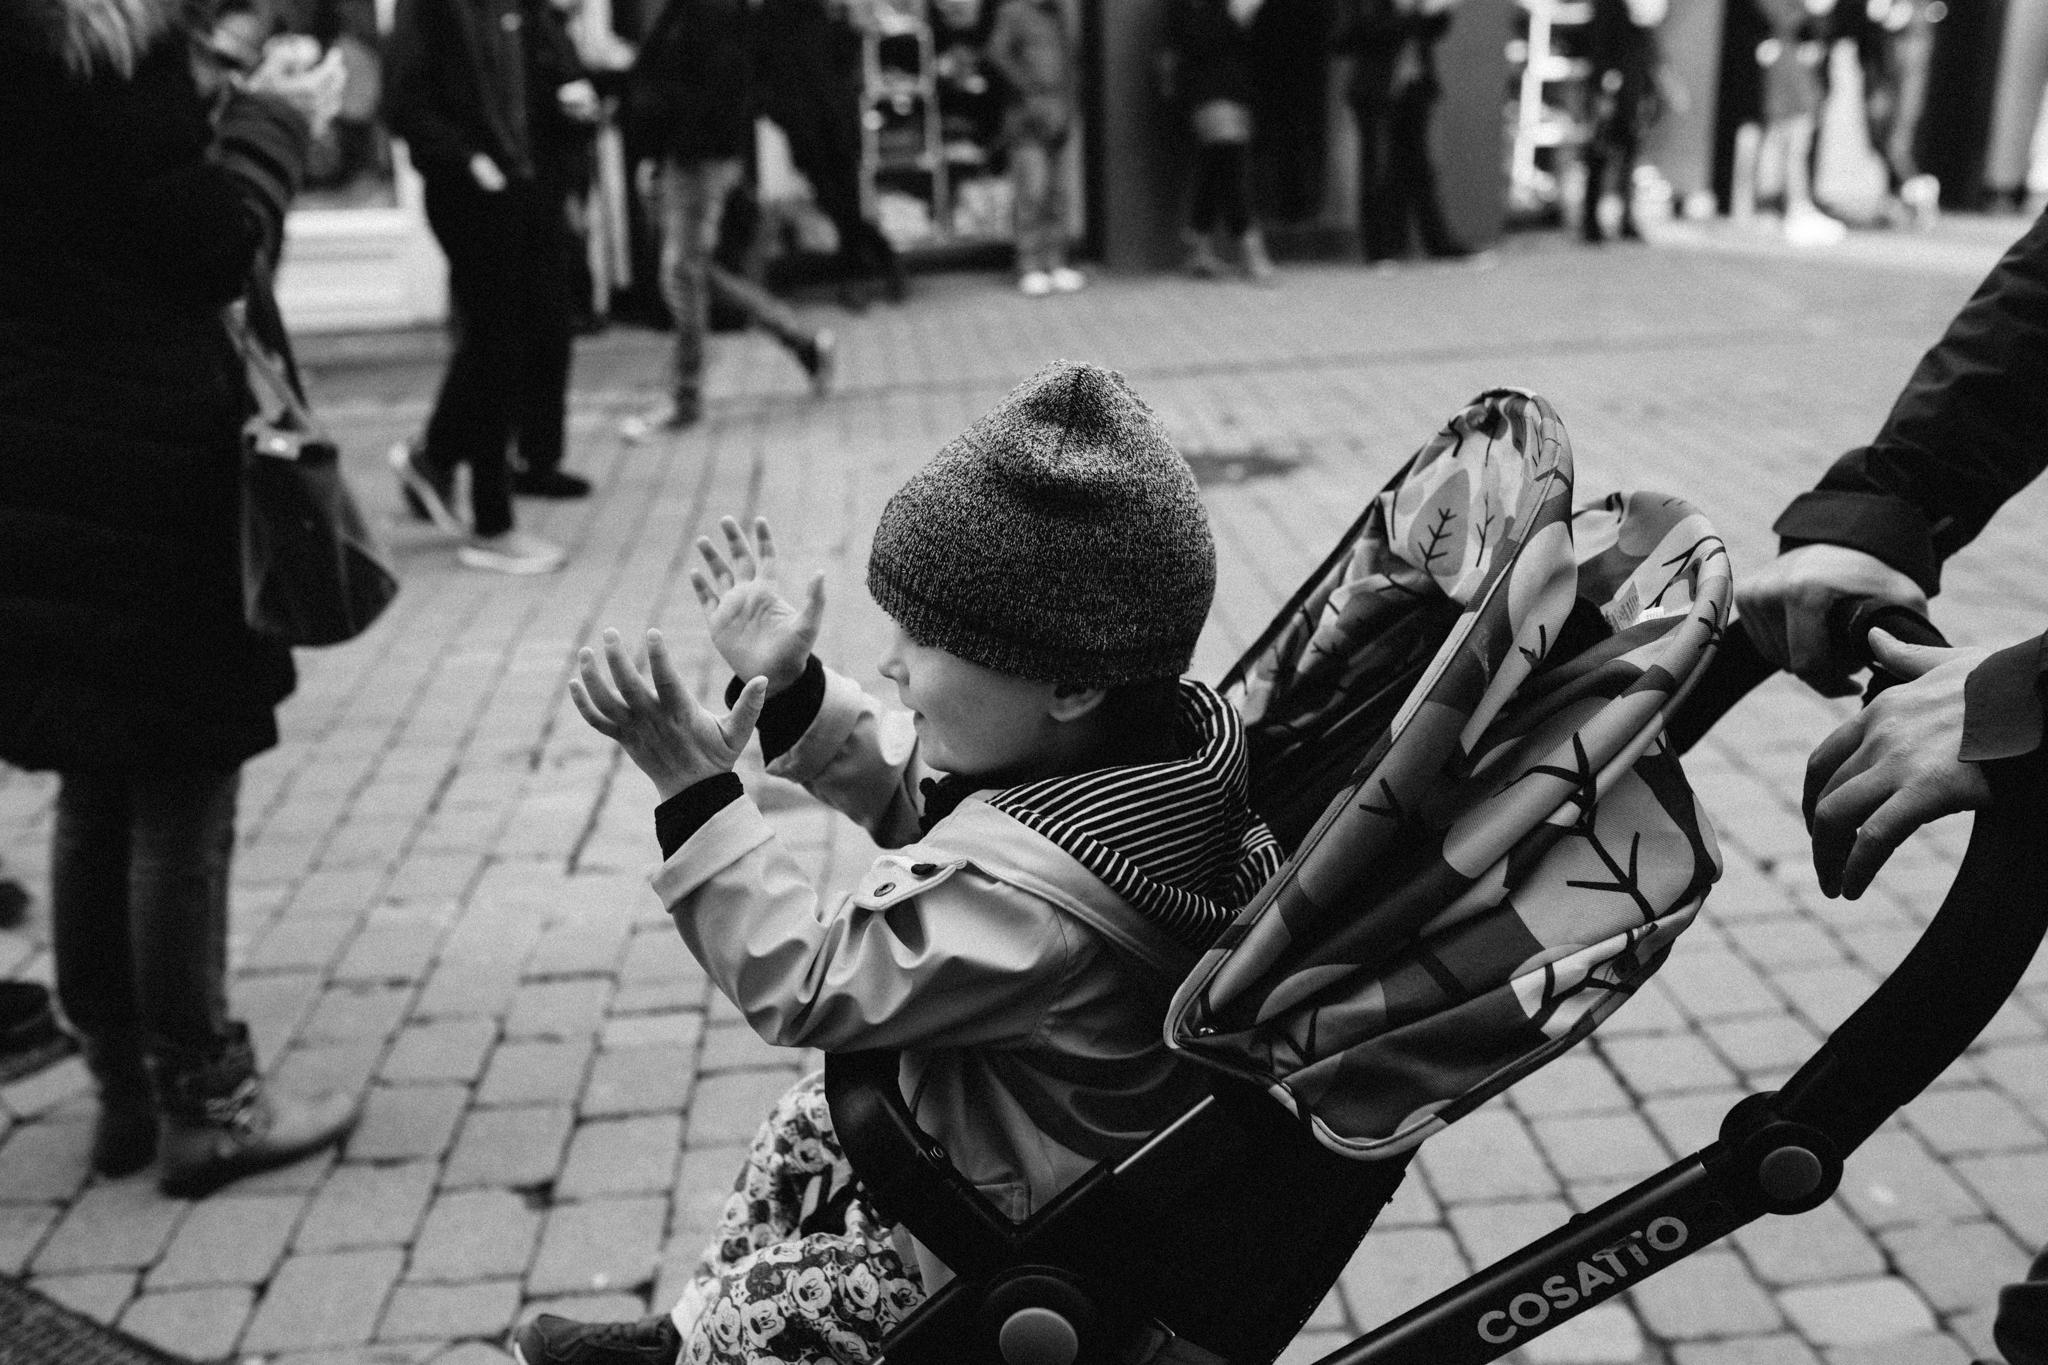 ireland_galway_dublin_rebecca_burt_photography-121.jpg